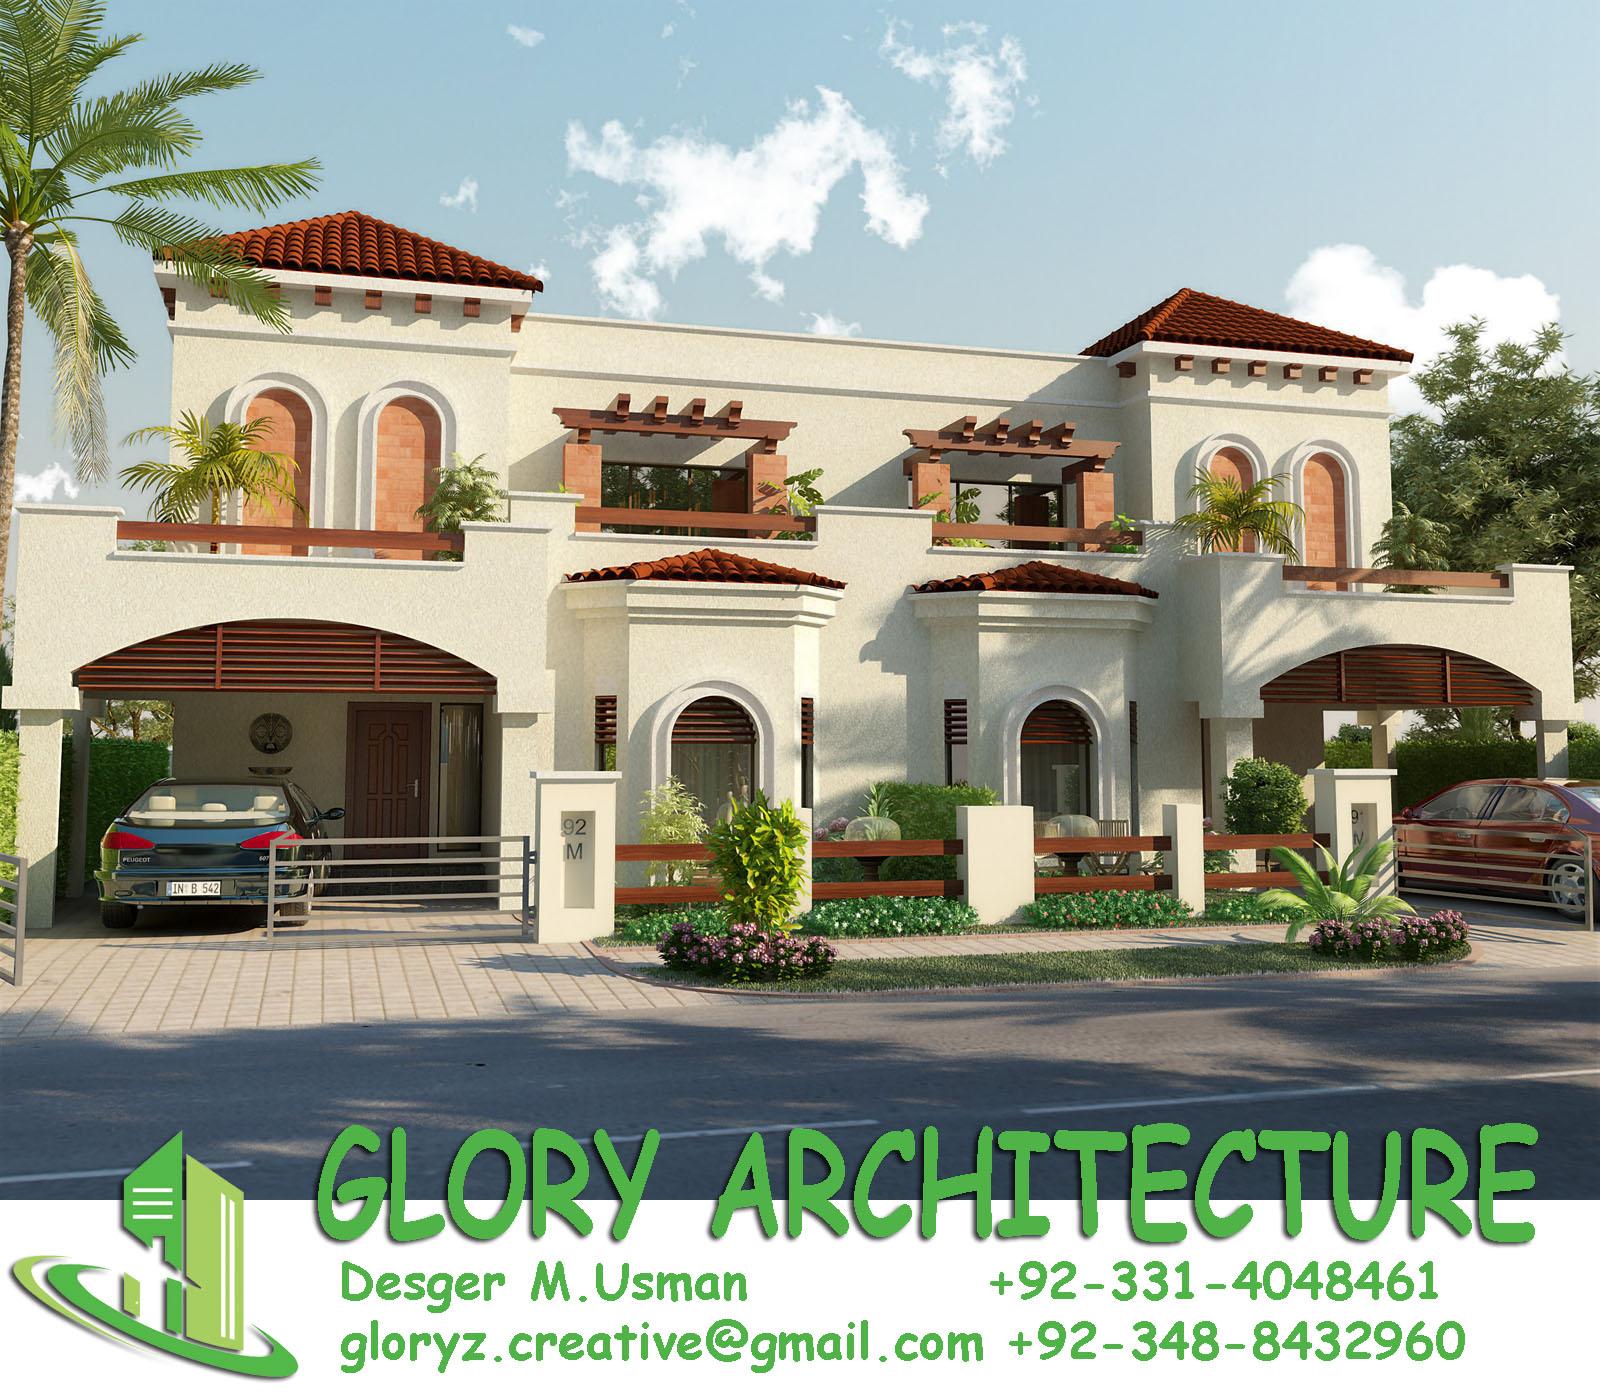 Glory Architecture 25x50 House Elevation Islamabad: Glory Architecture